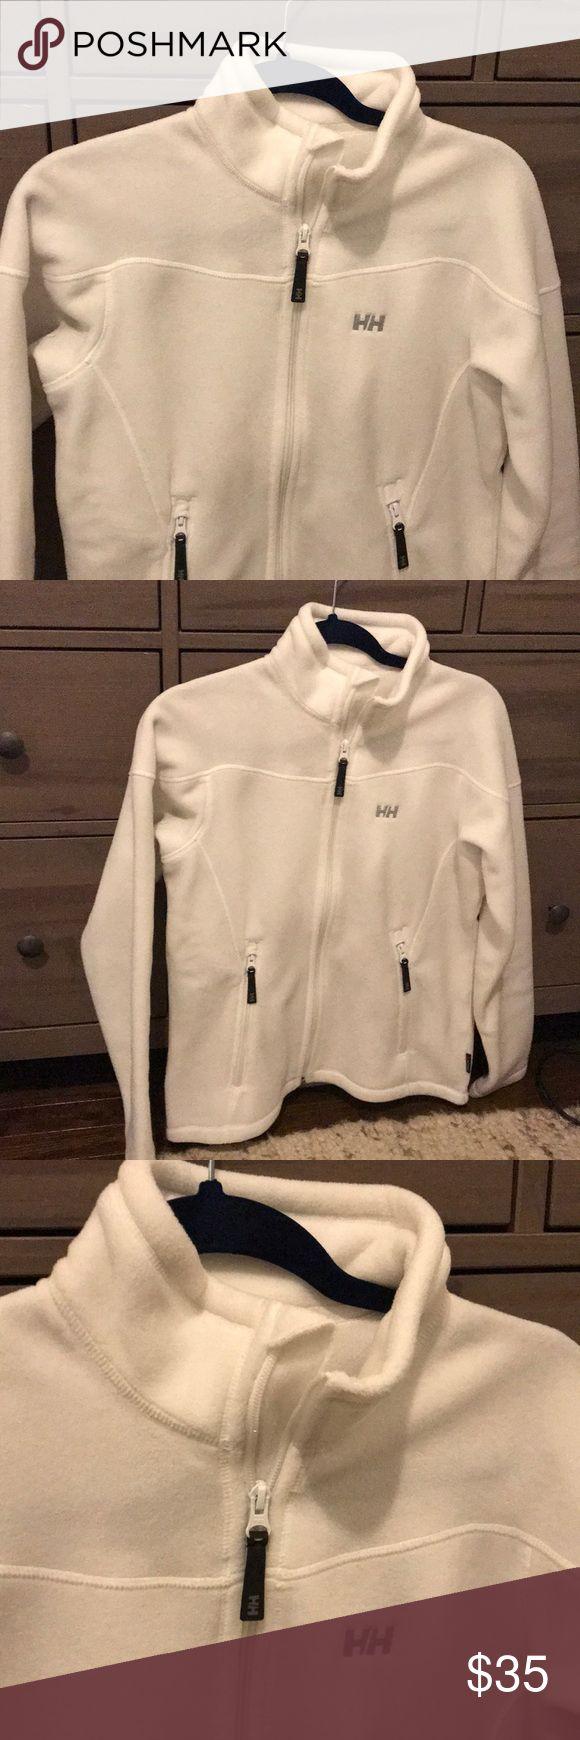 NWOT Helly Hansen White Full-Zip Fleece Jacket NWOT full-zip fleece jacket in a beautiful white color. Size medium. Helly Hansen Jackets & Coats